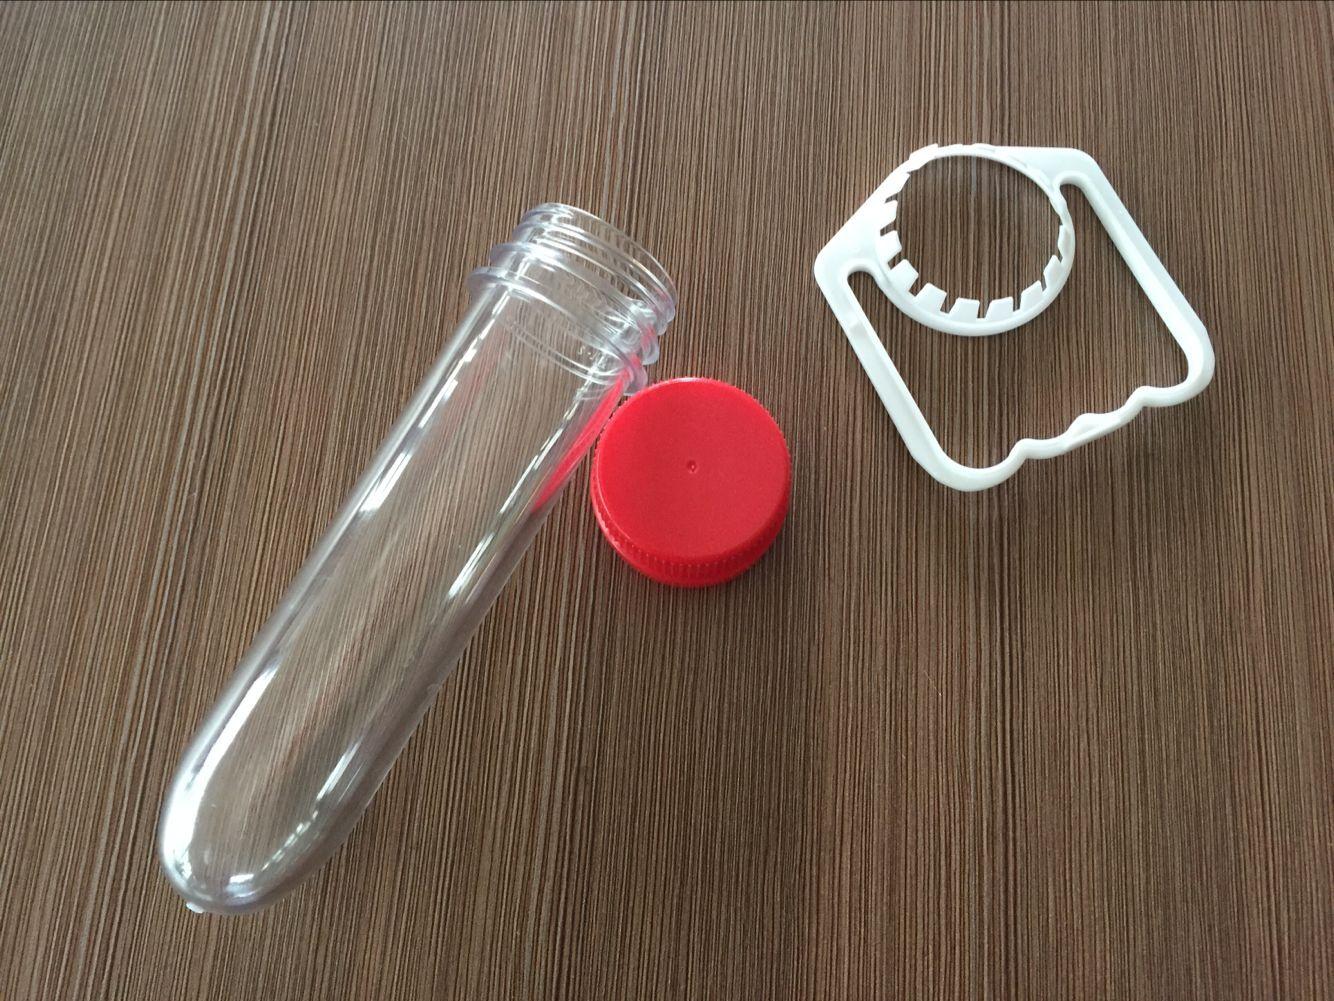 pet preform factory/28mmPCO1810 /28mmPOC1881/25/30mm neck pet mineral water bottle preform